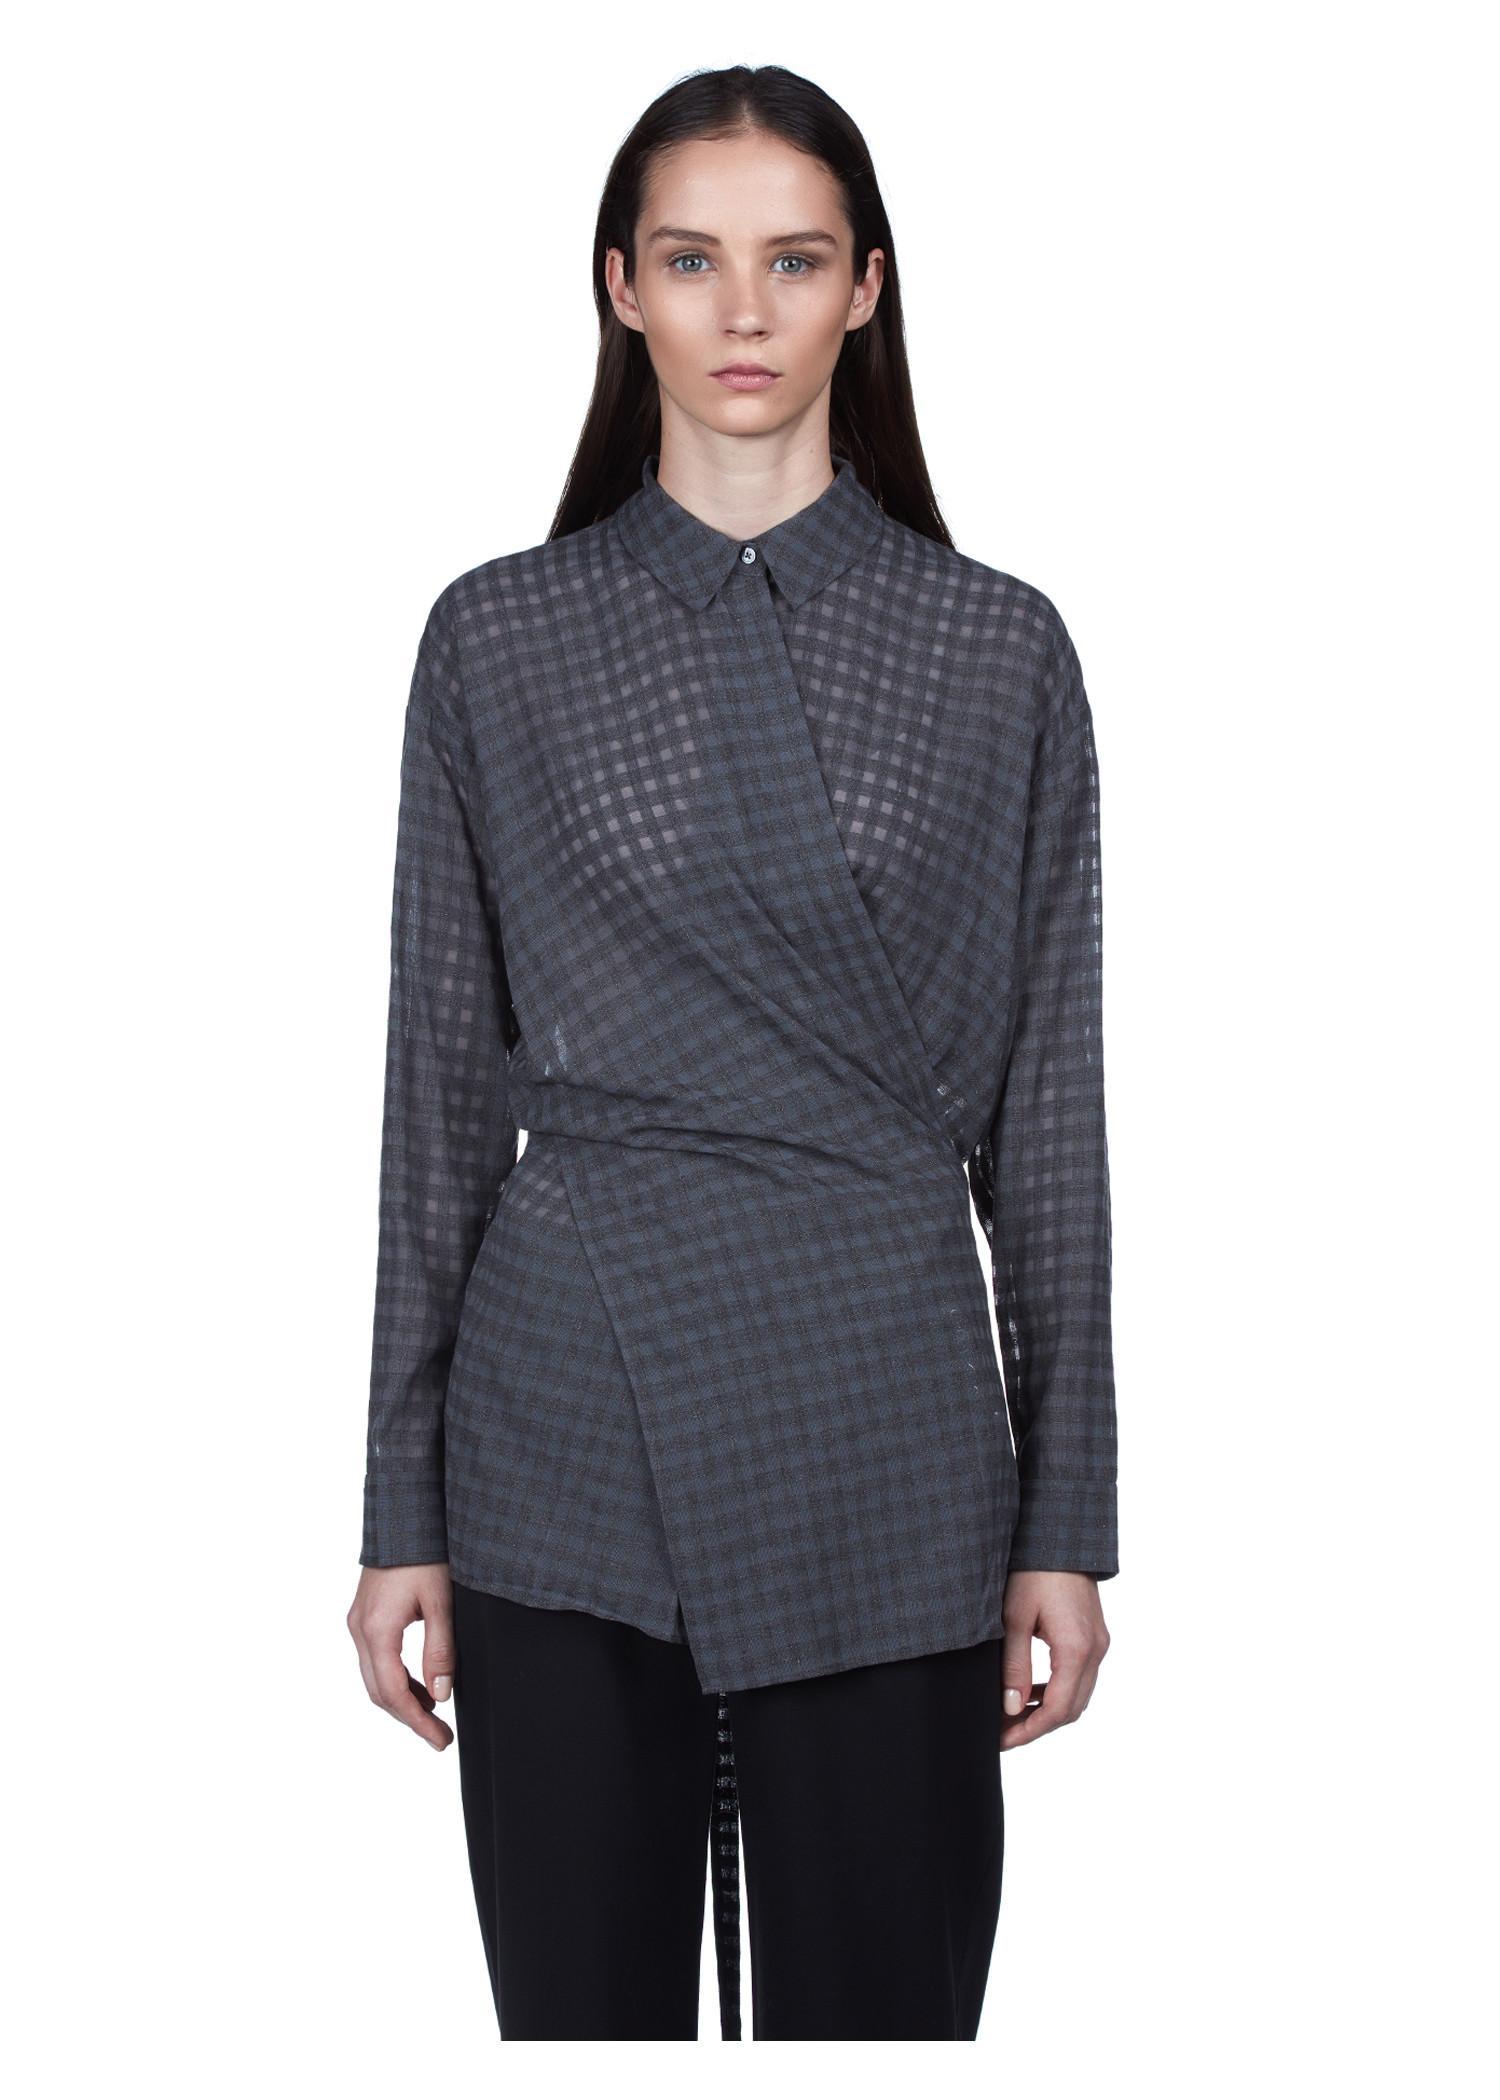 T By Alexander Wang Long Sleeve Wrap Tie Blouse In Heather Grey